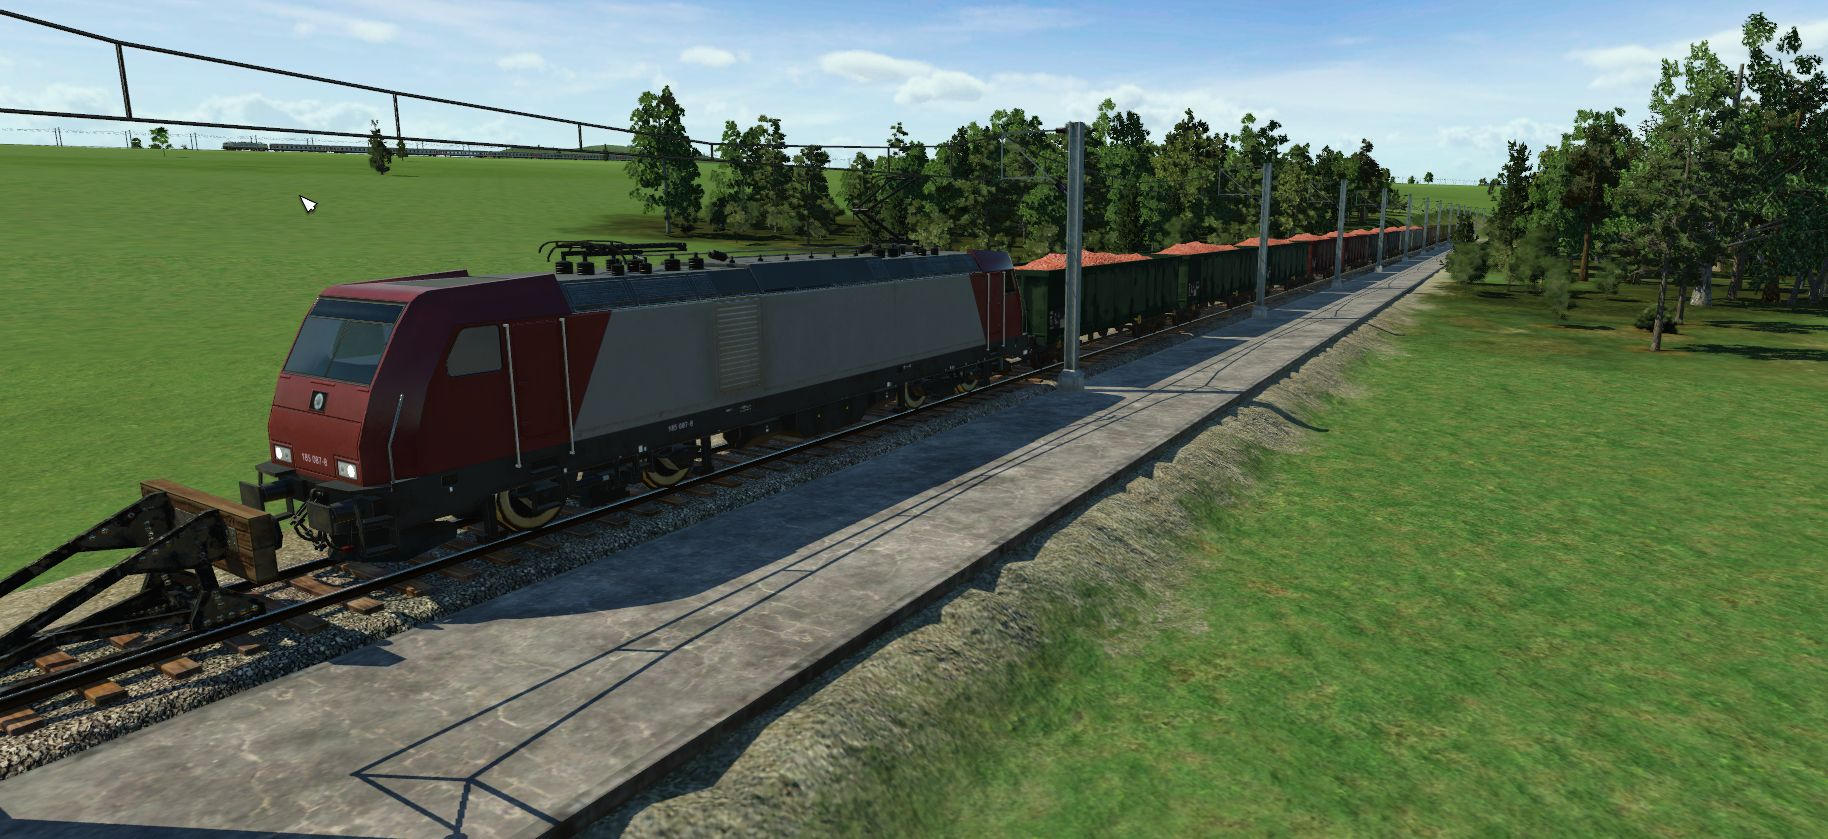 Transport Fever - recenze + průvodce hrou 12845